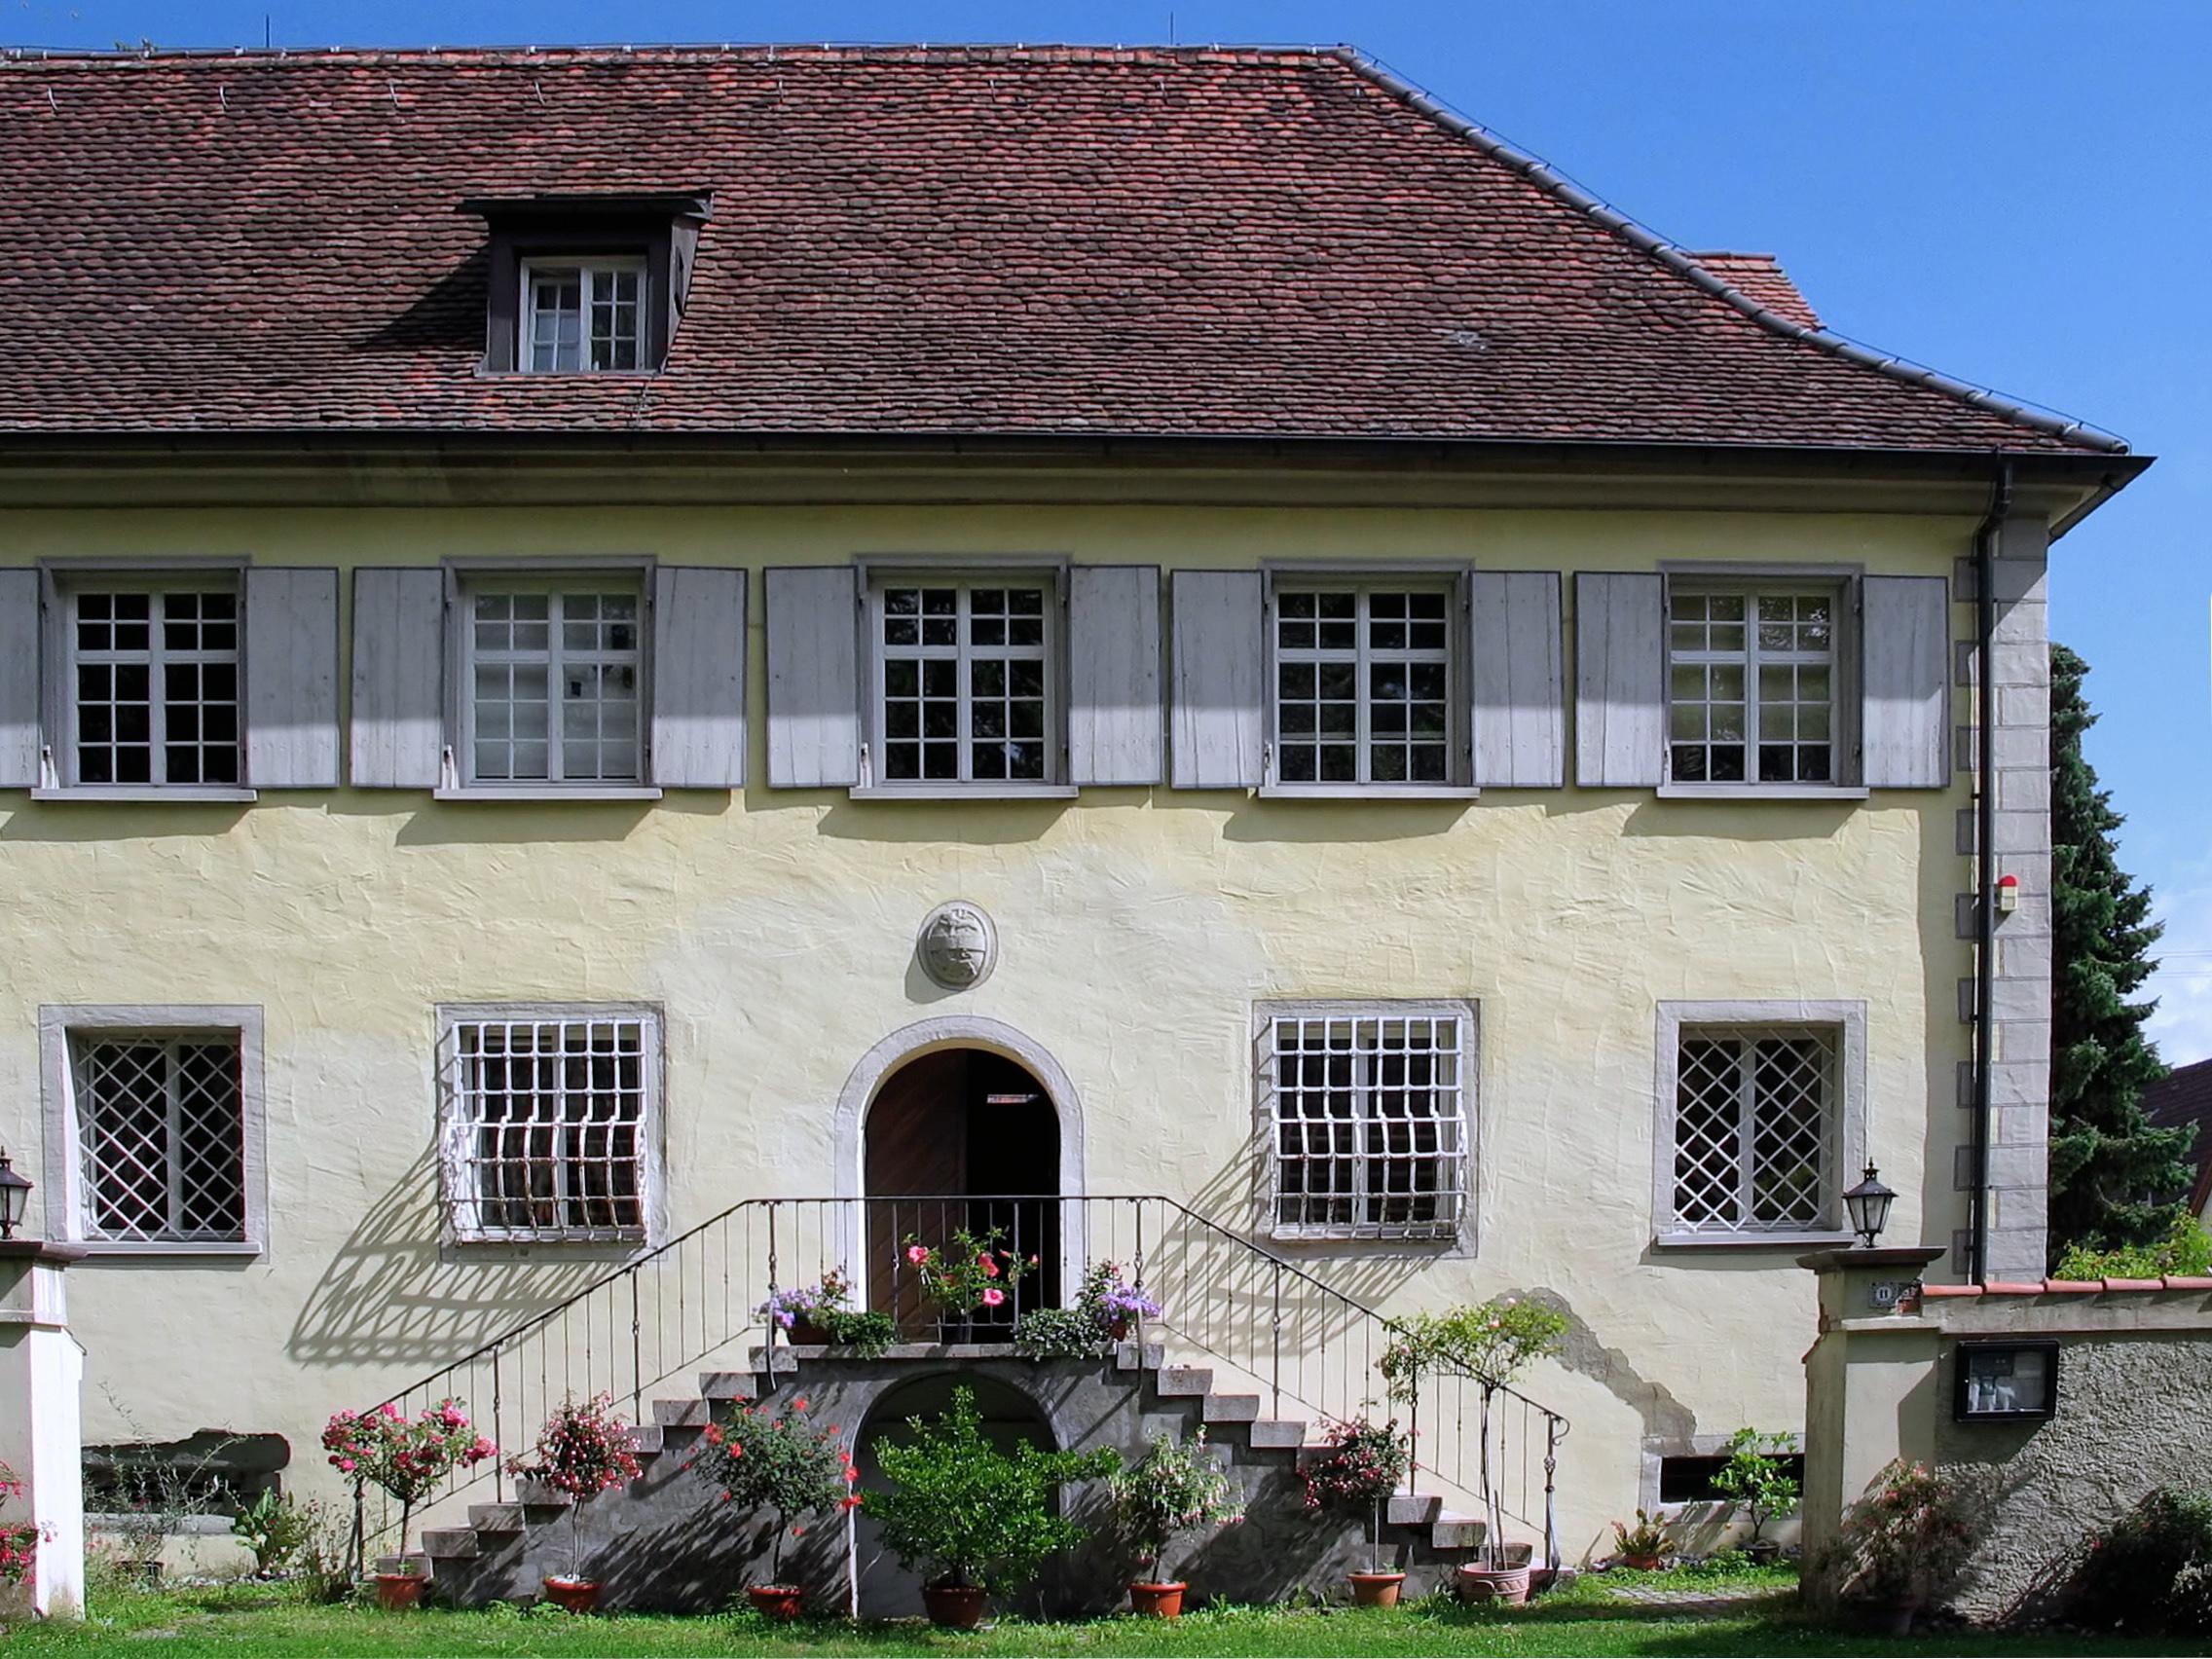 Datei:Maison ernst jünger wilflingen.jpg – Wikipedia